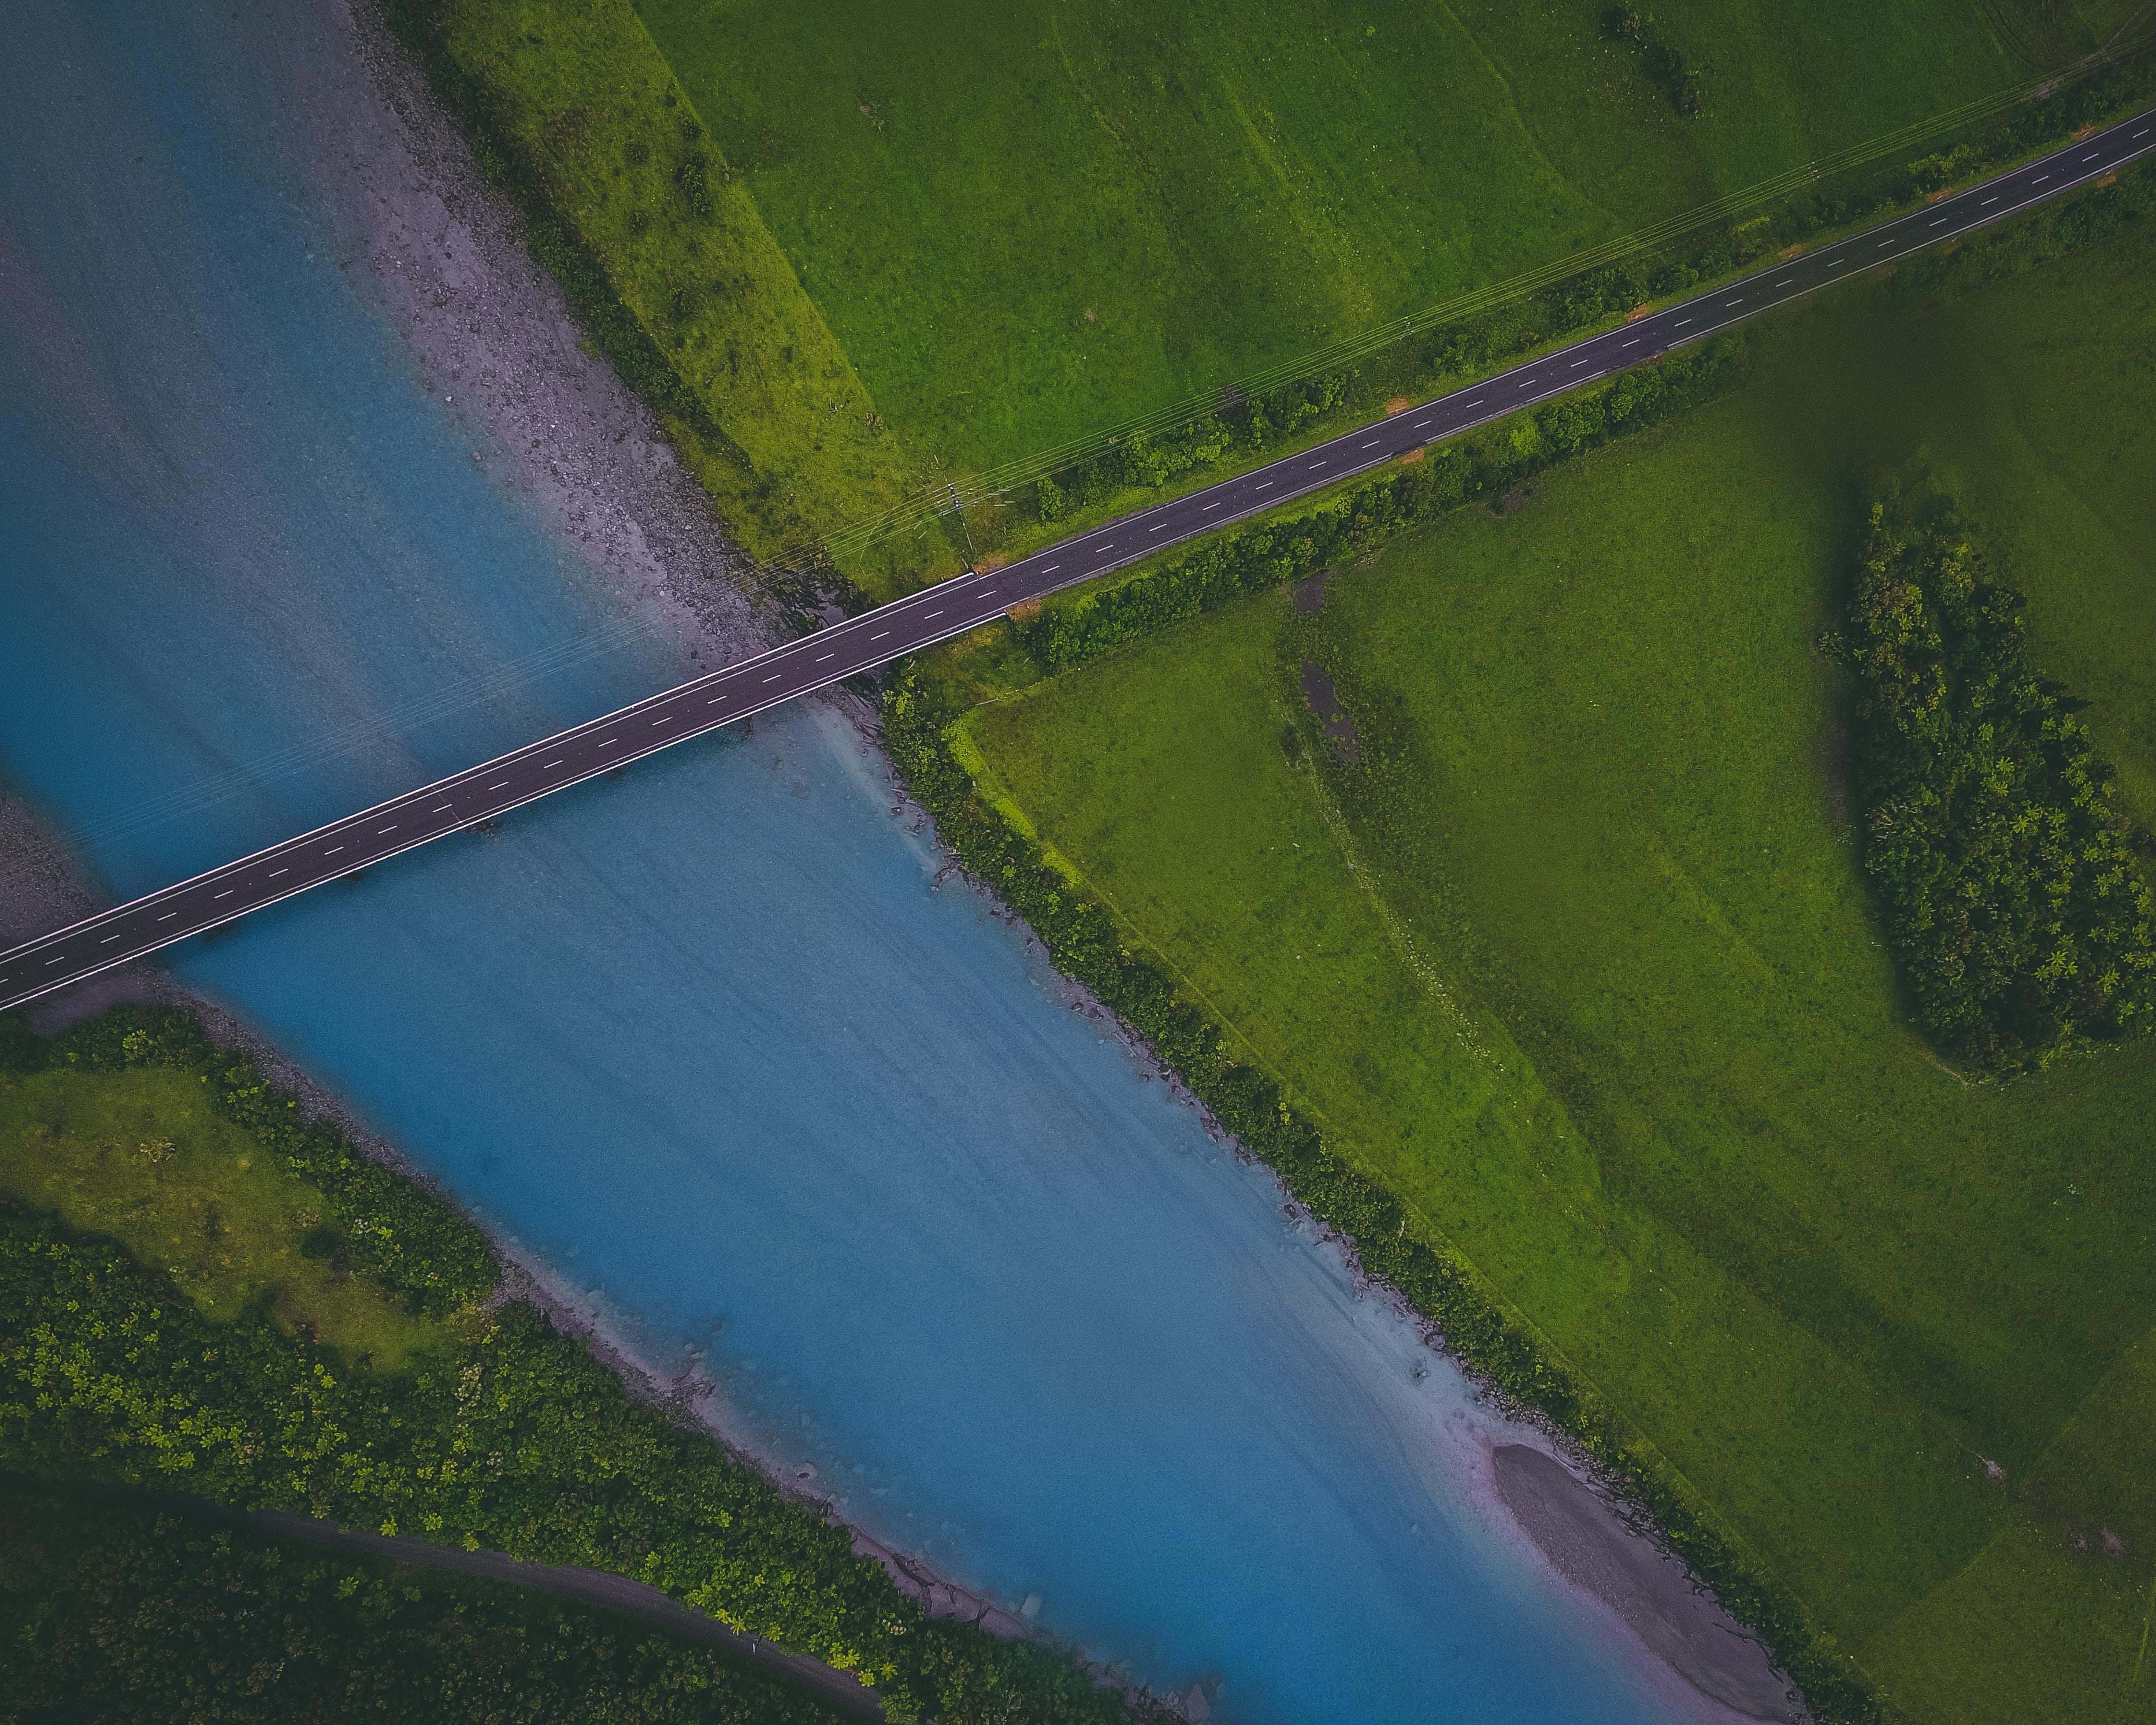 aerial photography of bridge near green grass field